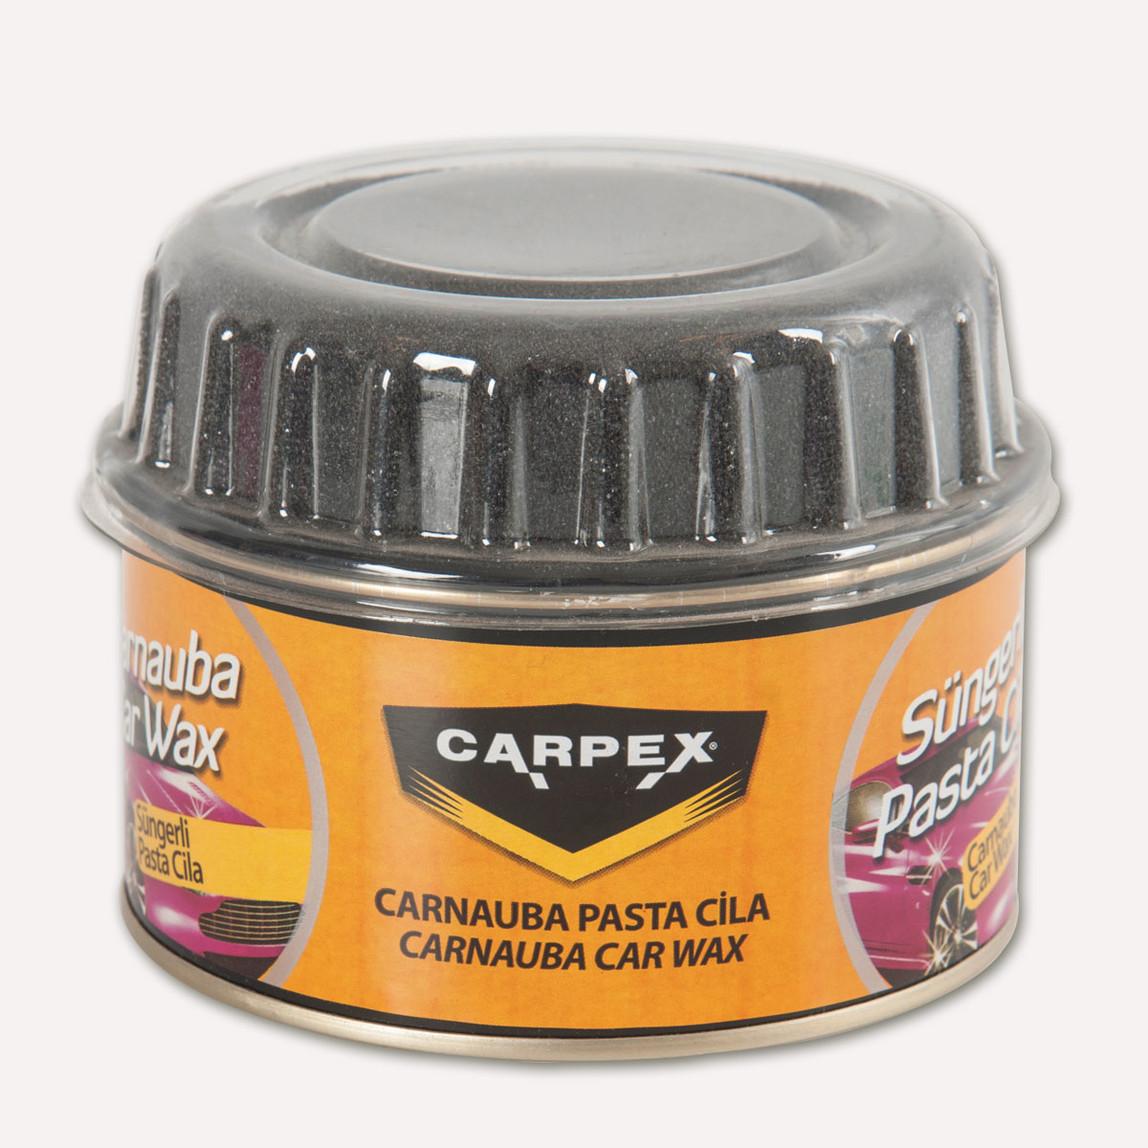 Carpex Carnauba Süngerli 250 gr Pasta Cila